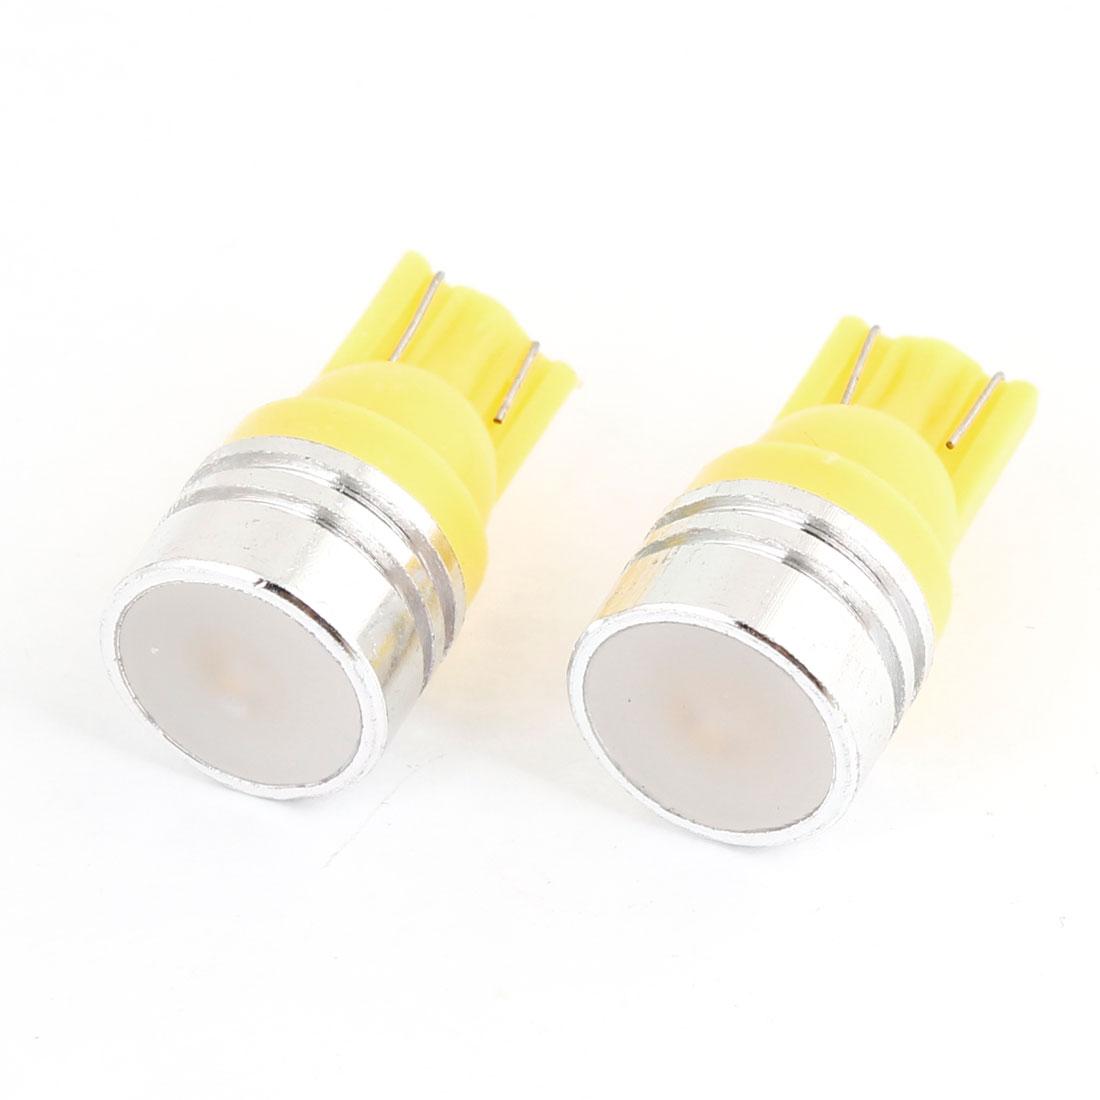 2 Pcs Yellow 1W T10 Ceramic LED Light lamp Bulbs for Auto Car